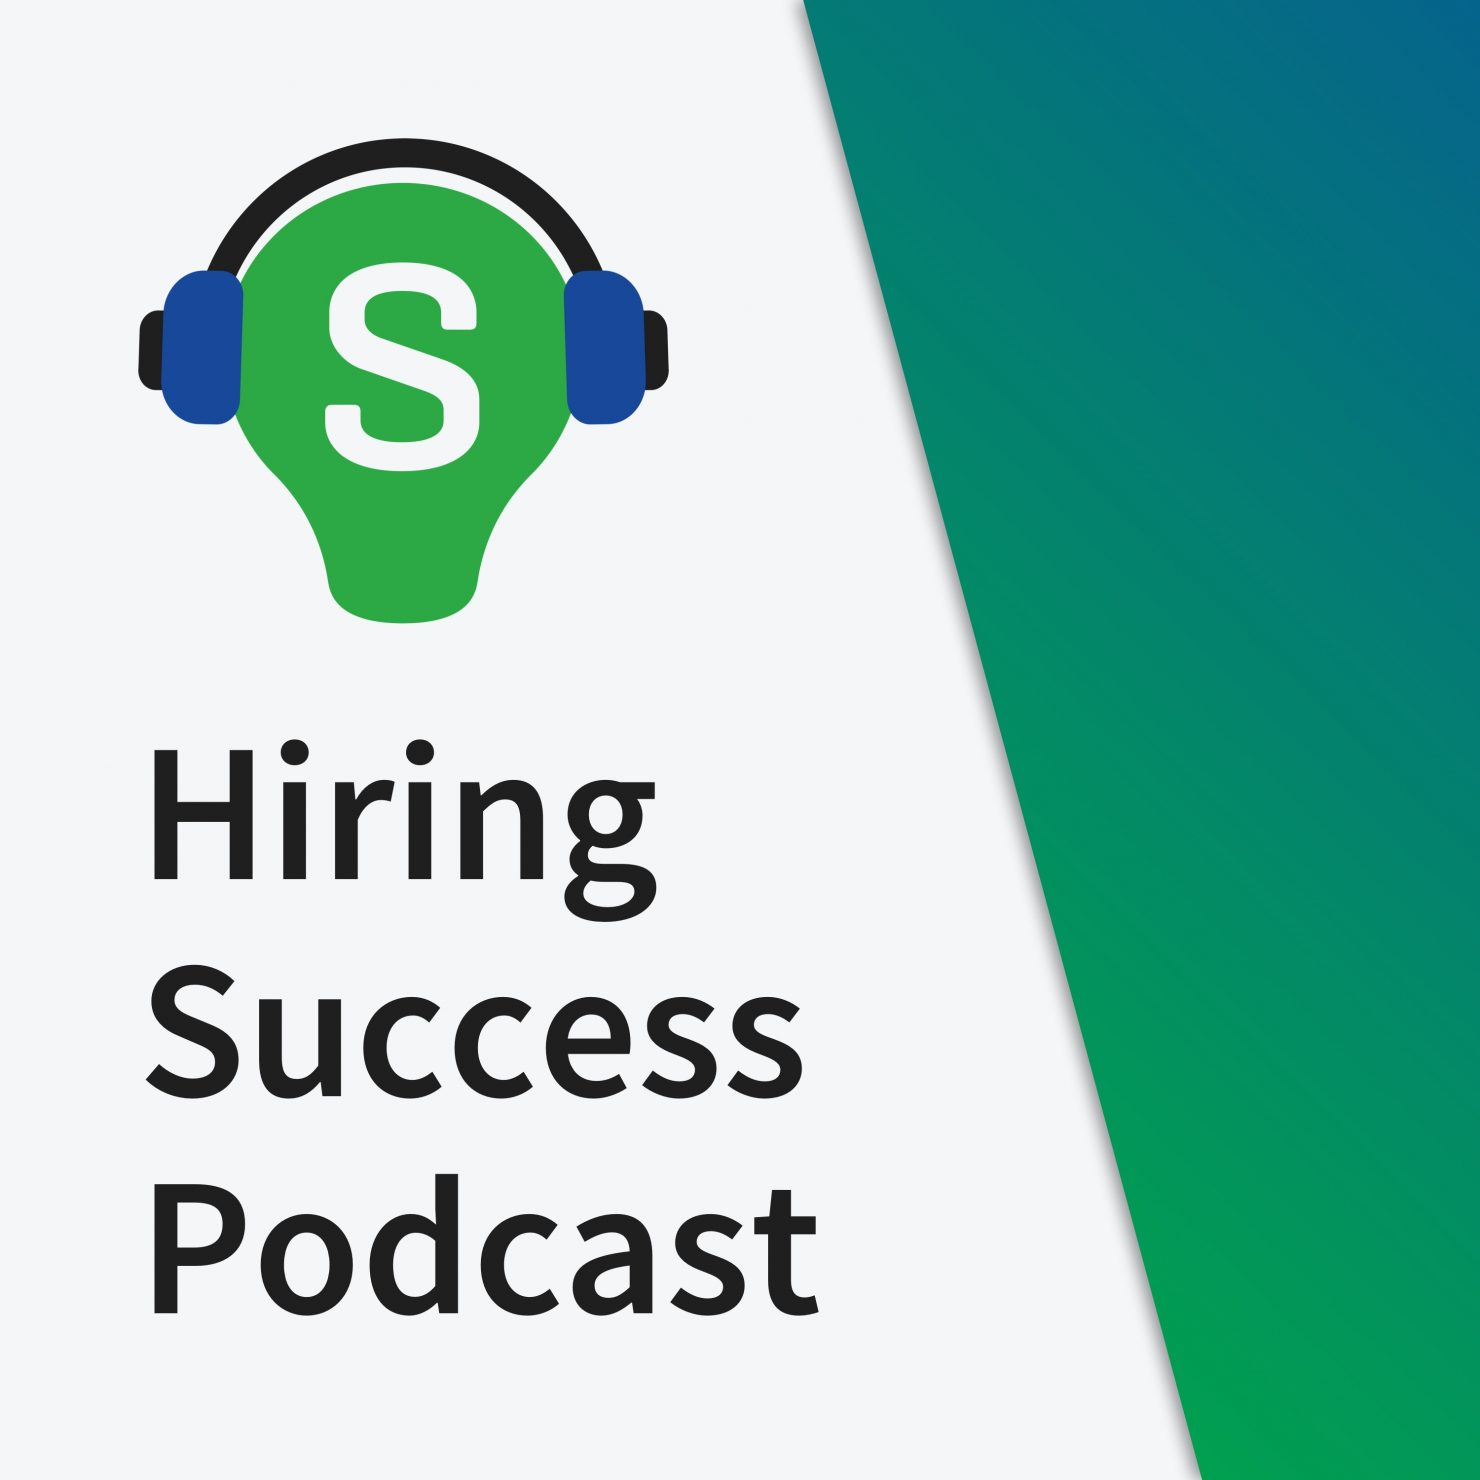 Hiring Success Podcast